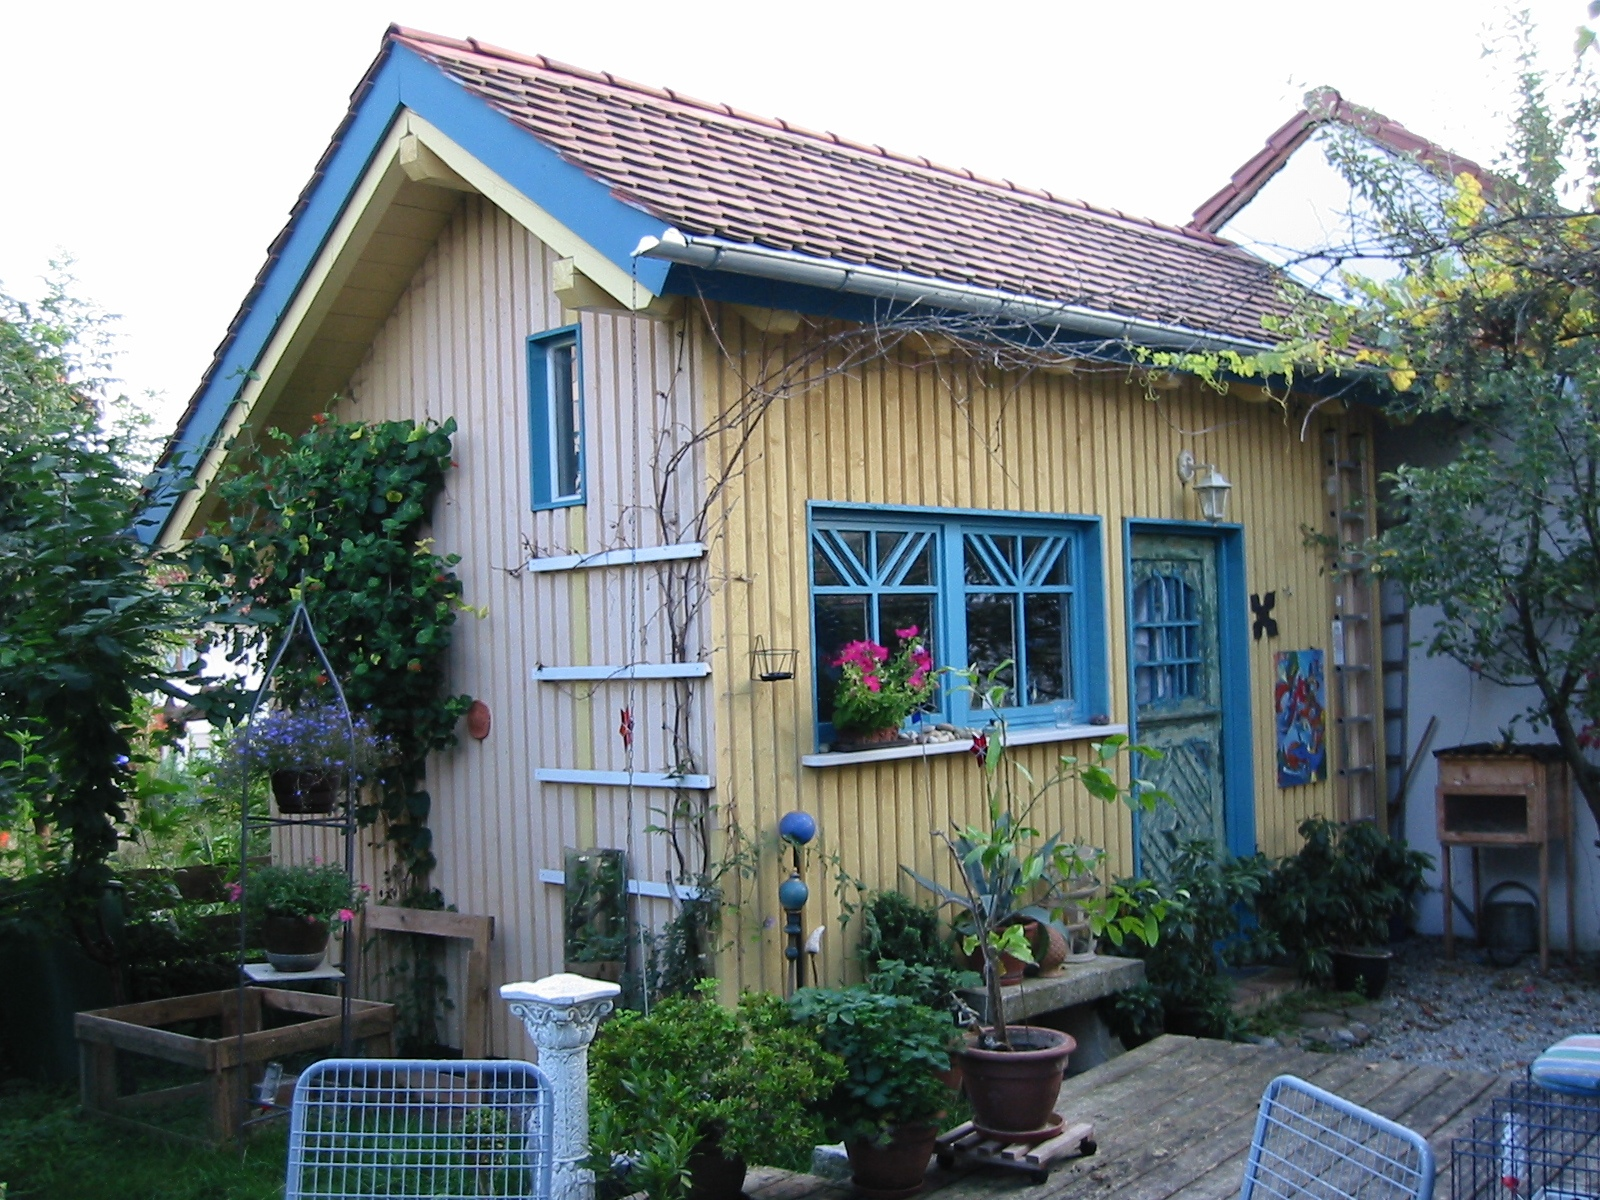 Atelier in Dettenschwang, Werkschau 2005